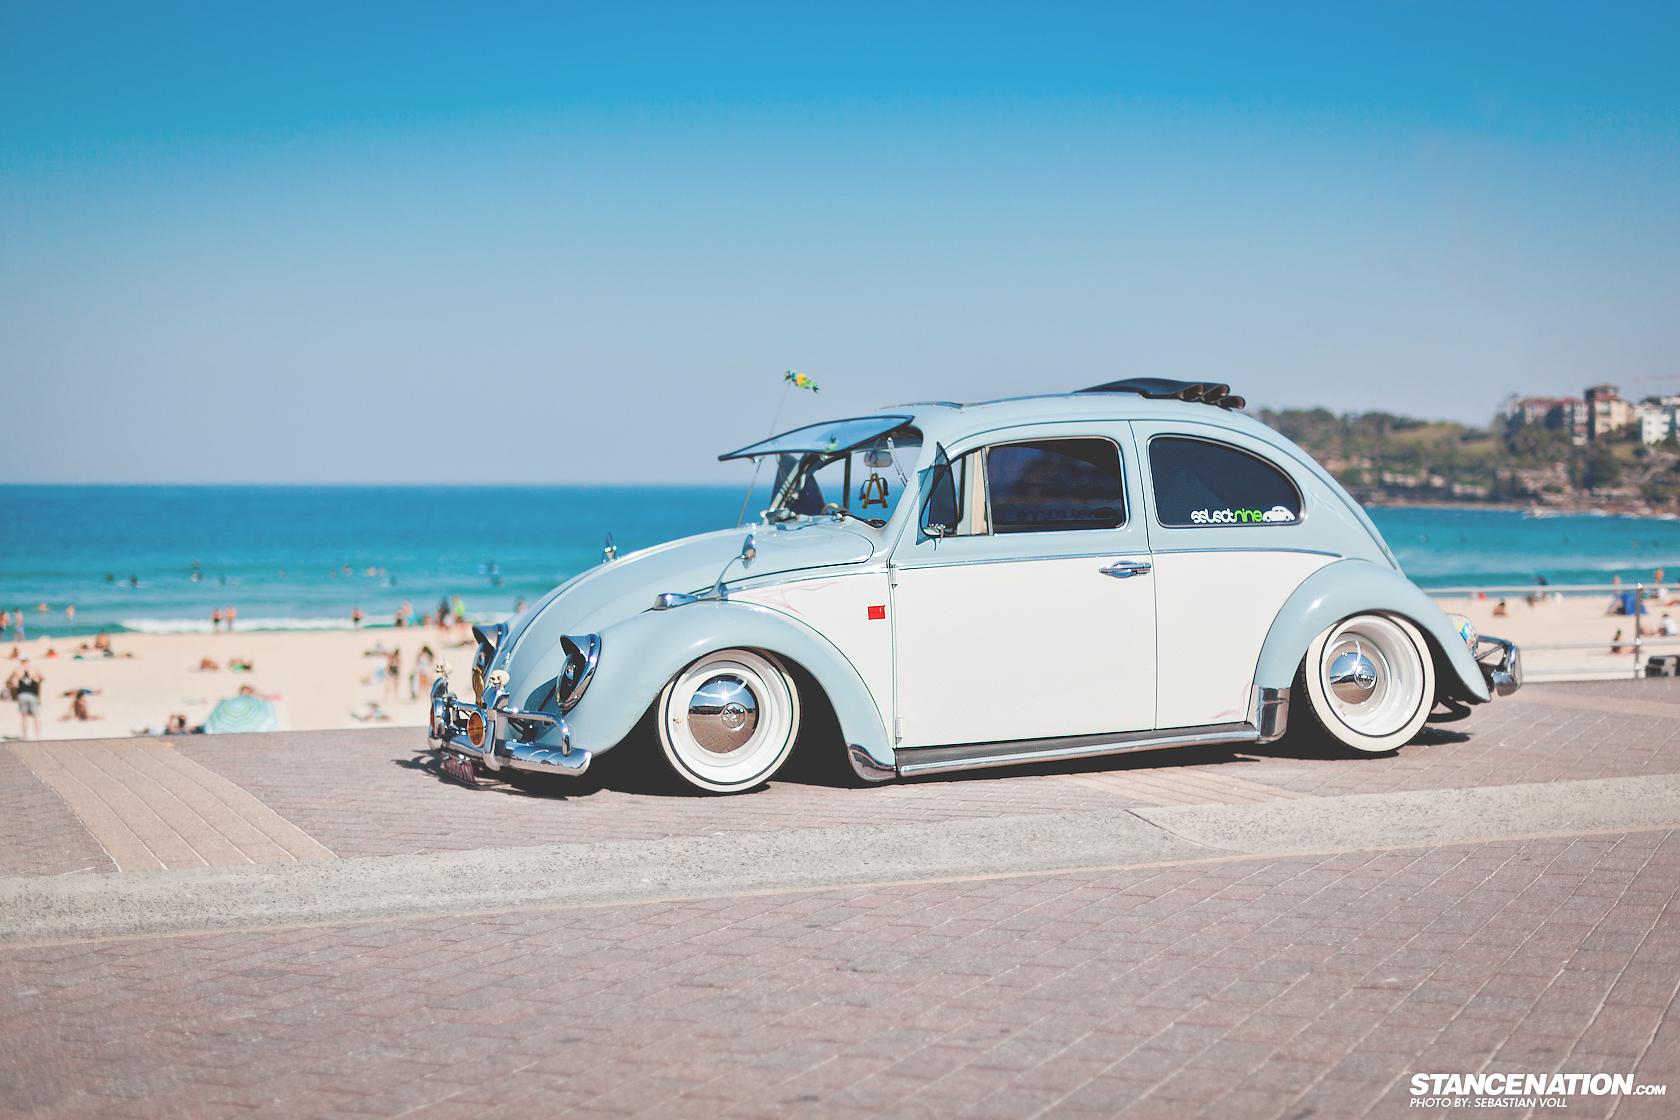 VW 2003 vw bug : Buggin' // Bhathiya's Gorgeous VW Beetle. | StanceNation™ // Form ...